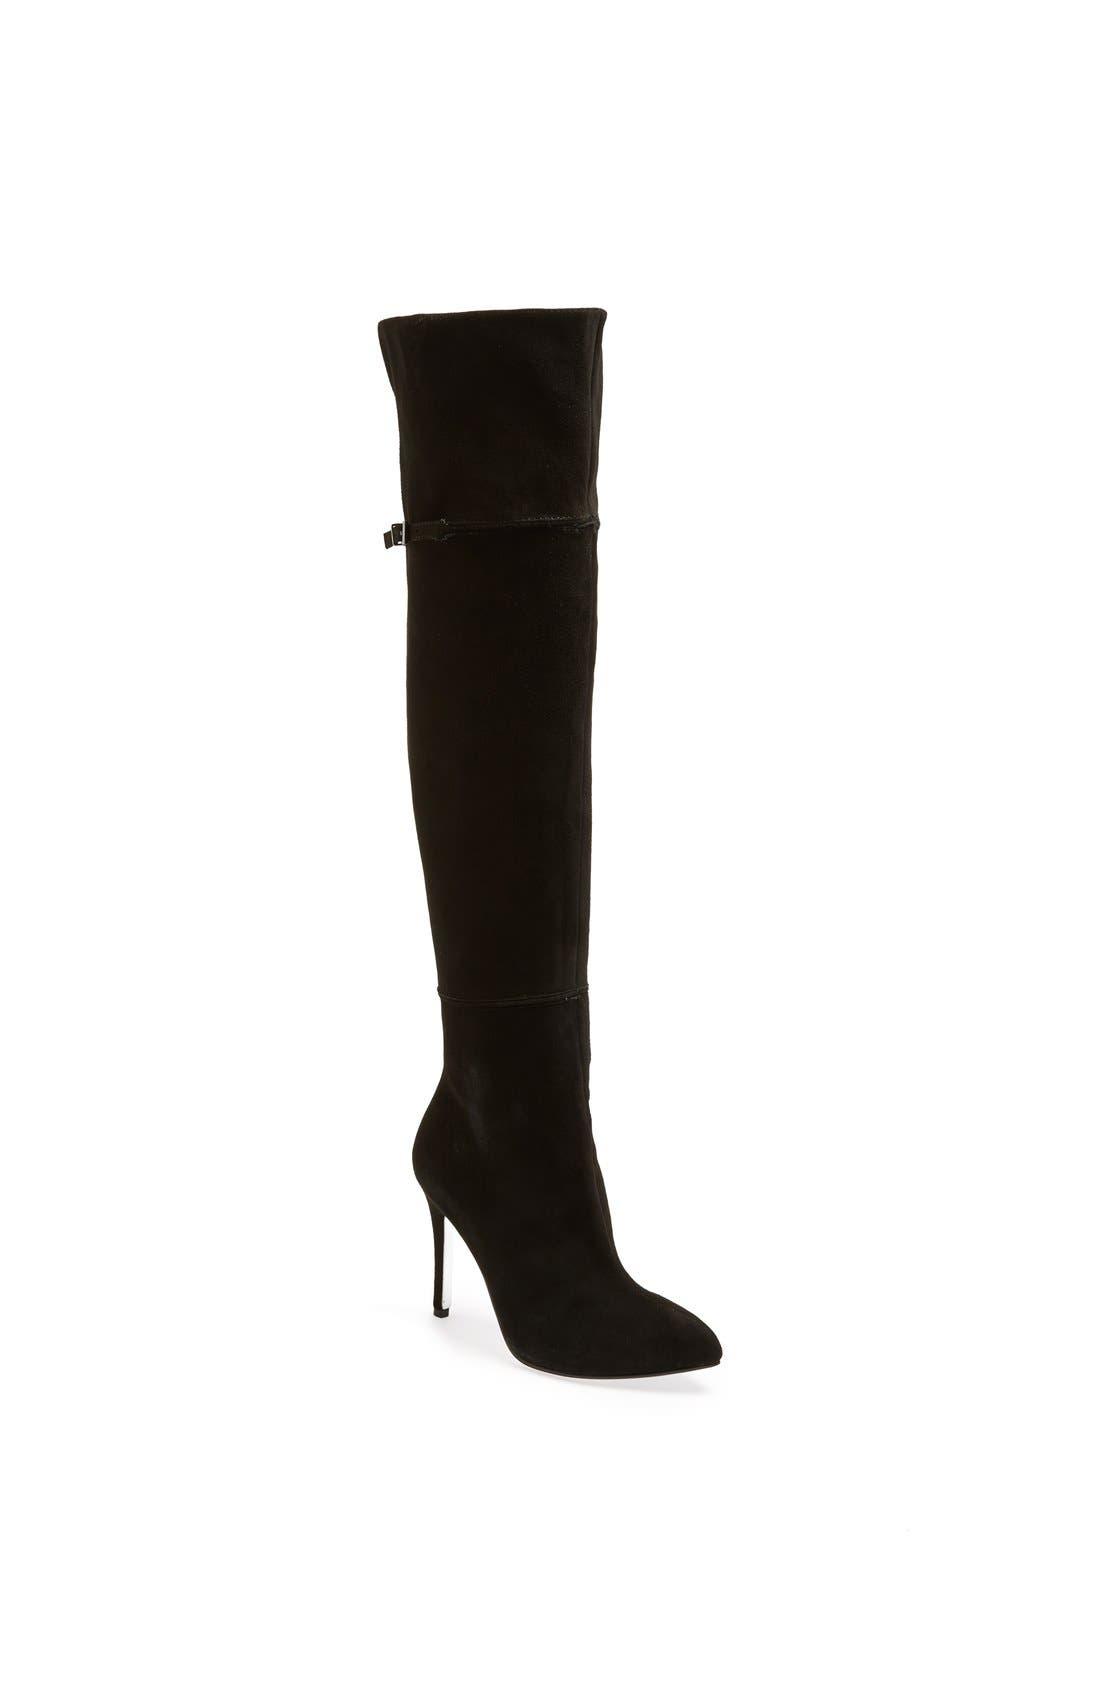 Alternate Image 1 Selected - Kristin Cavallari 'Cassie' Over the Knee Boot